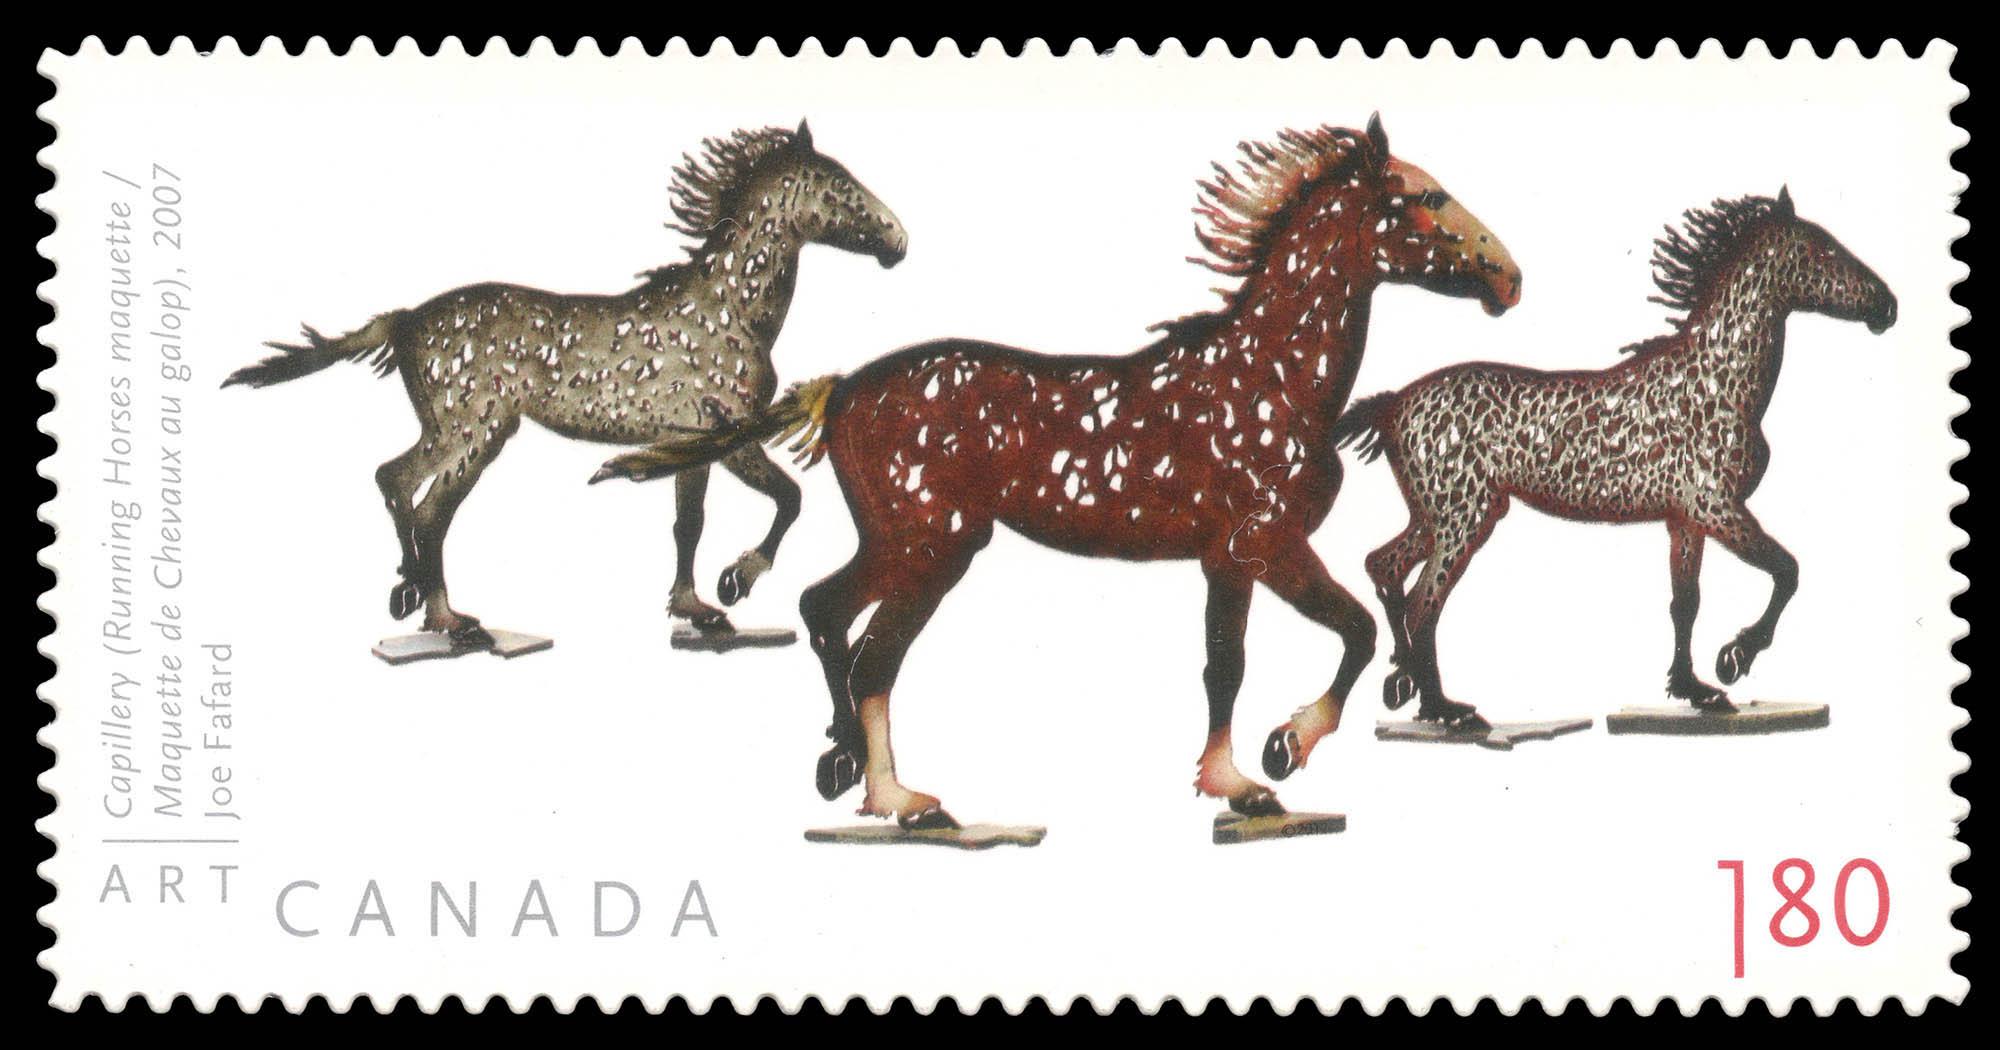 Capillery (Running Horses Maquette) - Joe Fafard Canada Postage Stamp | Art Canada